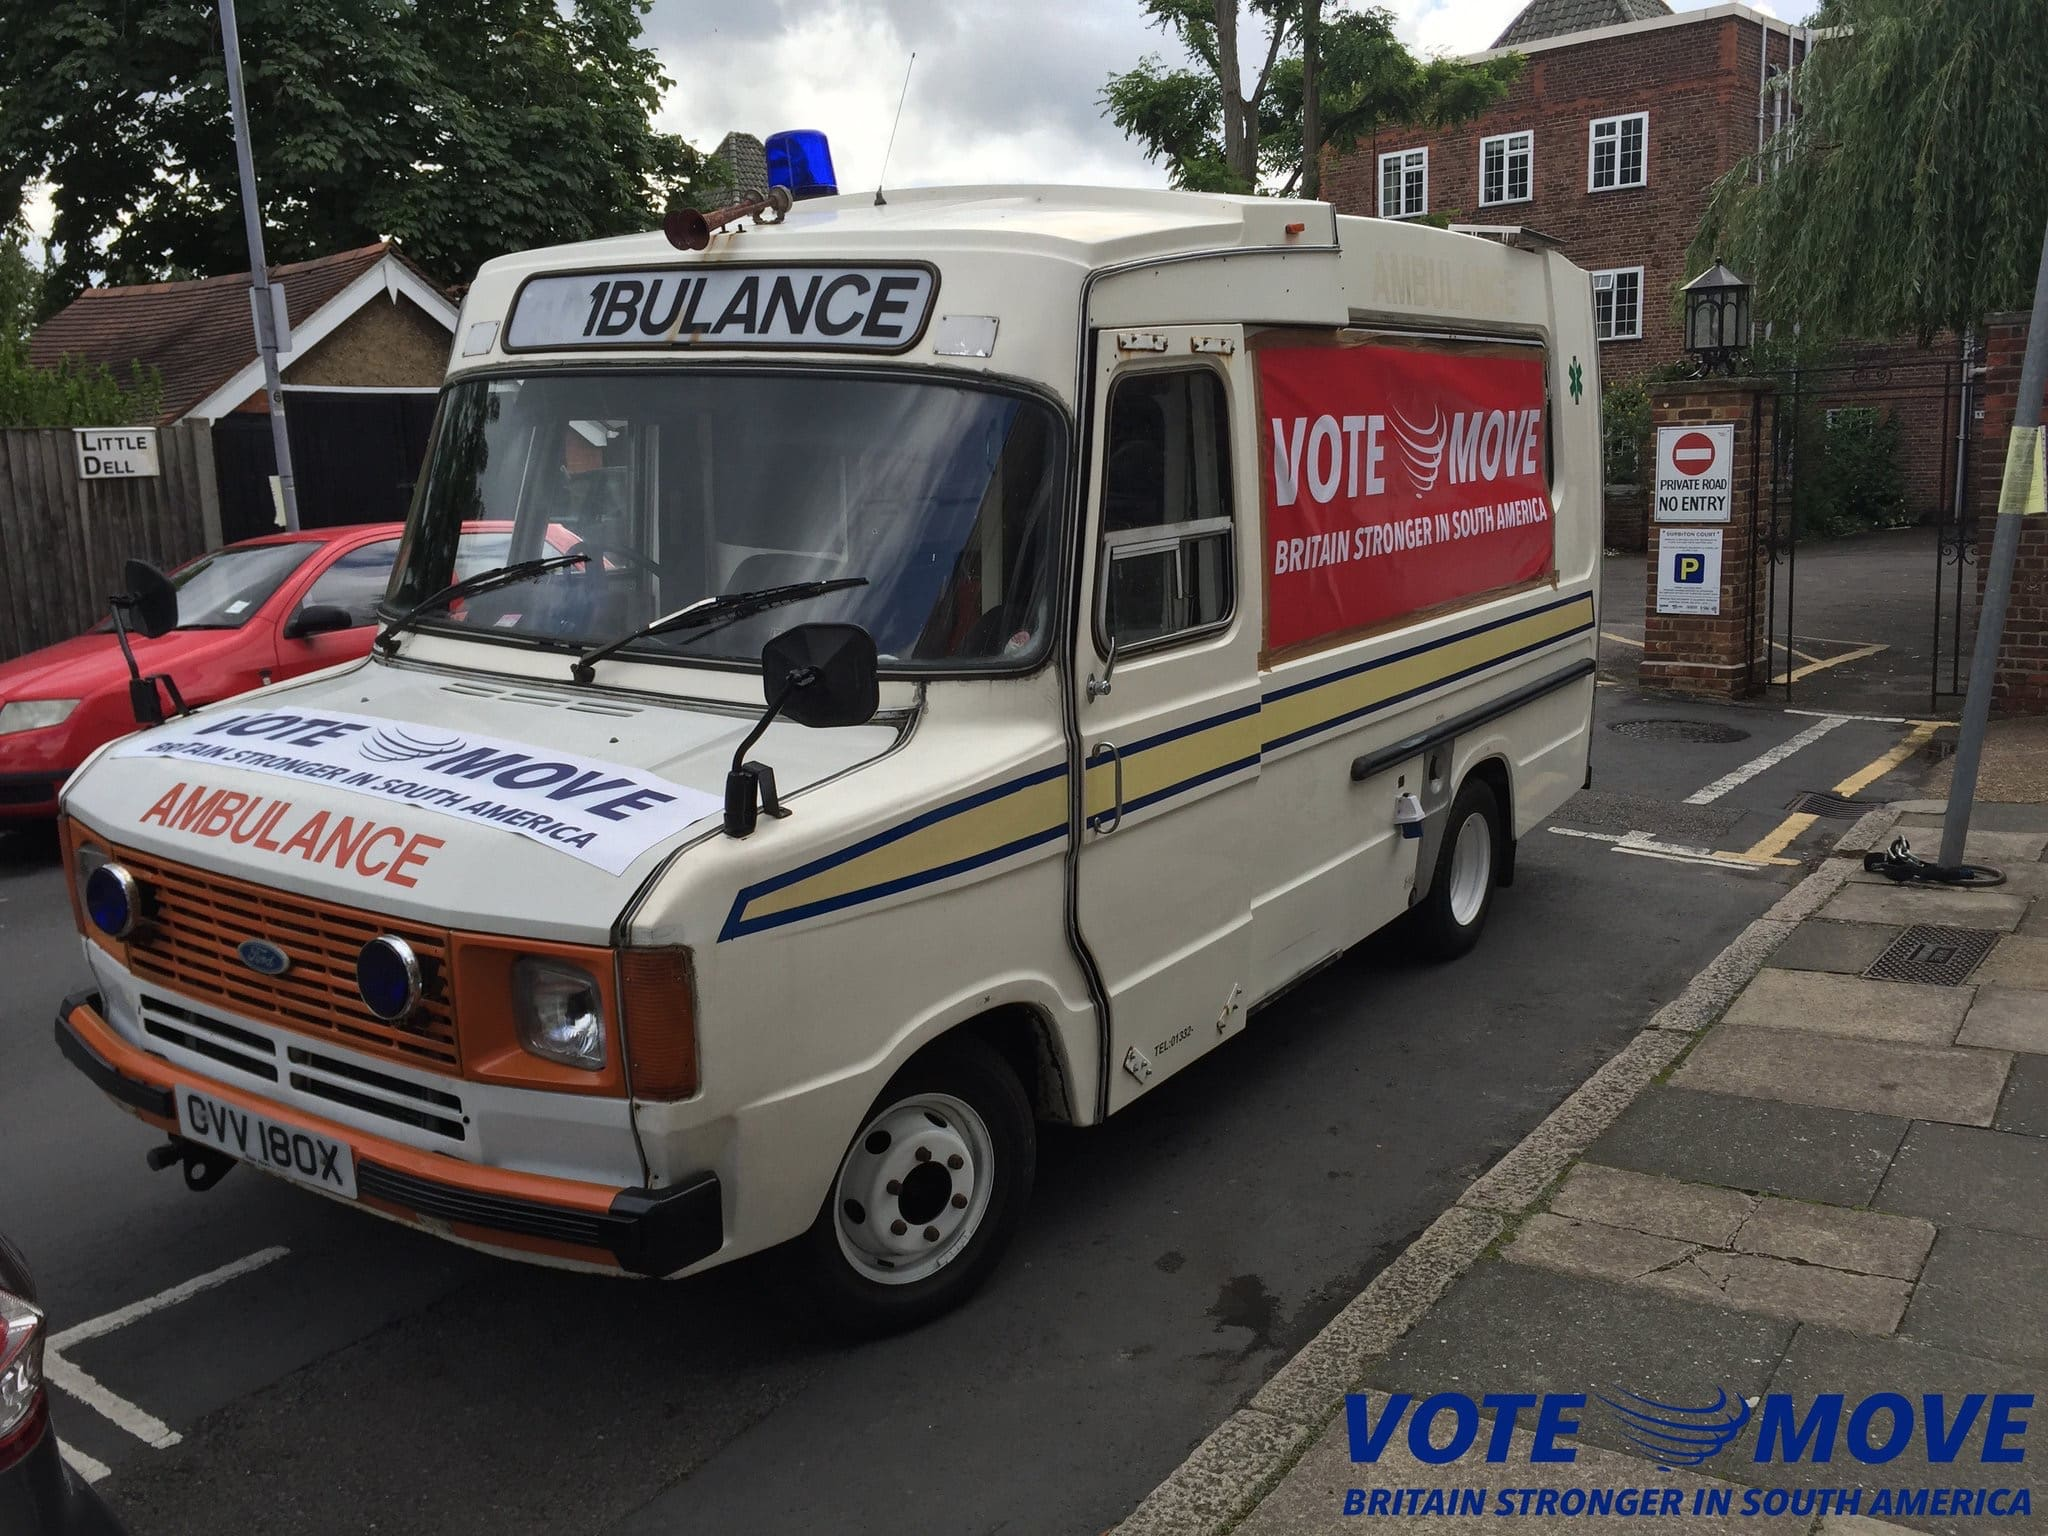 vote move battle bus